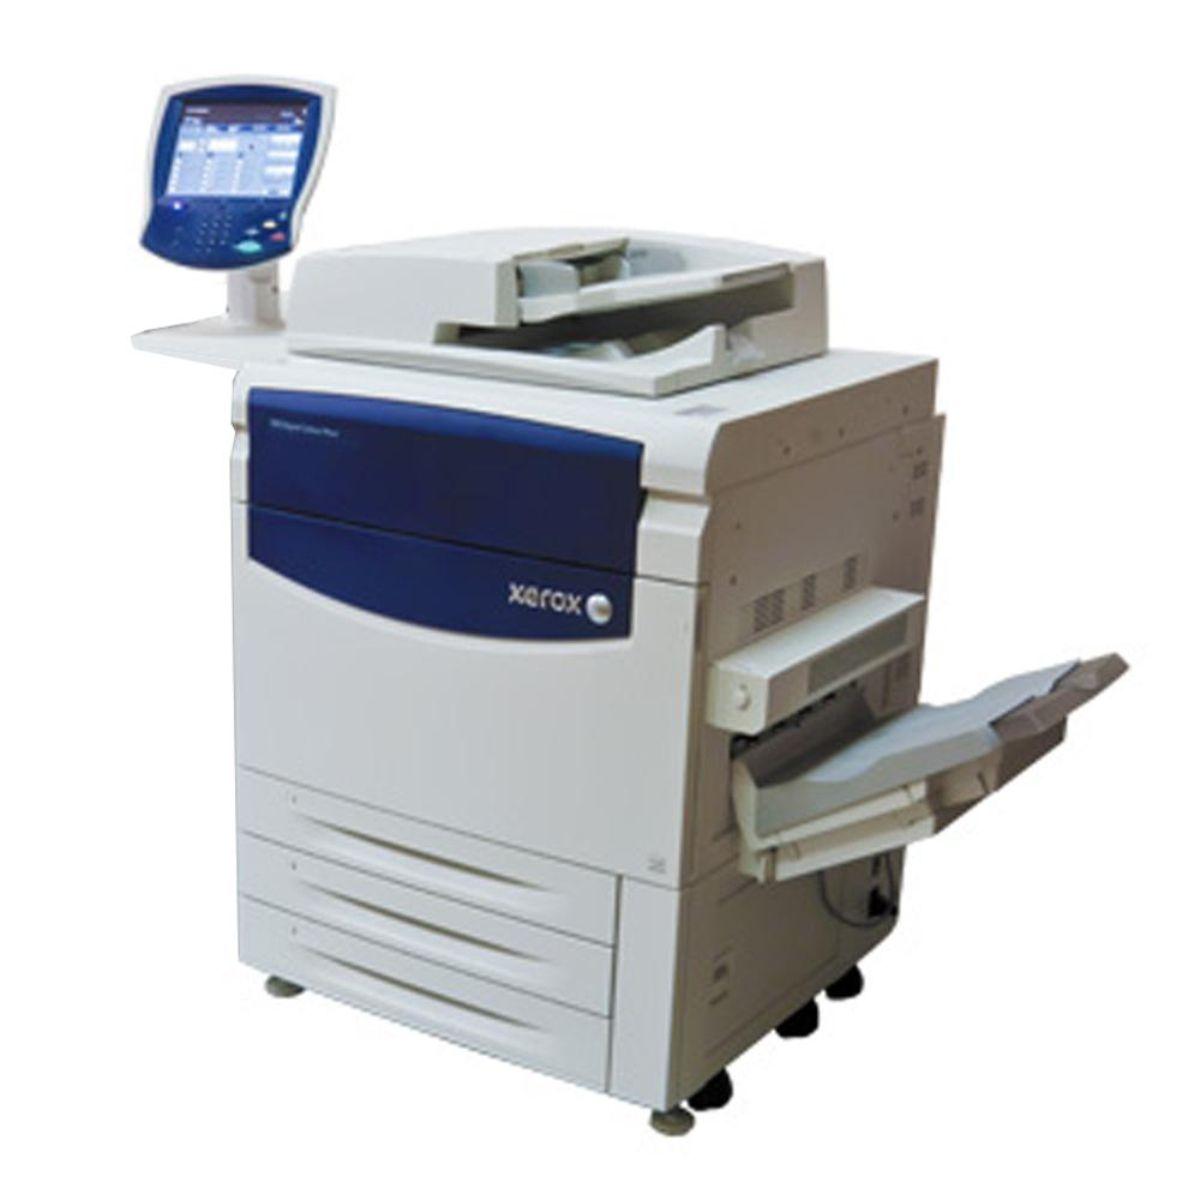 Multifuncional Xerox X700 Seminova